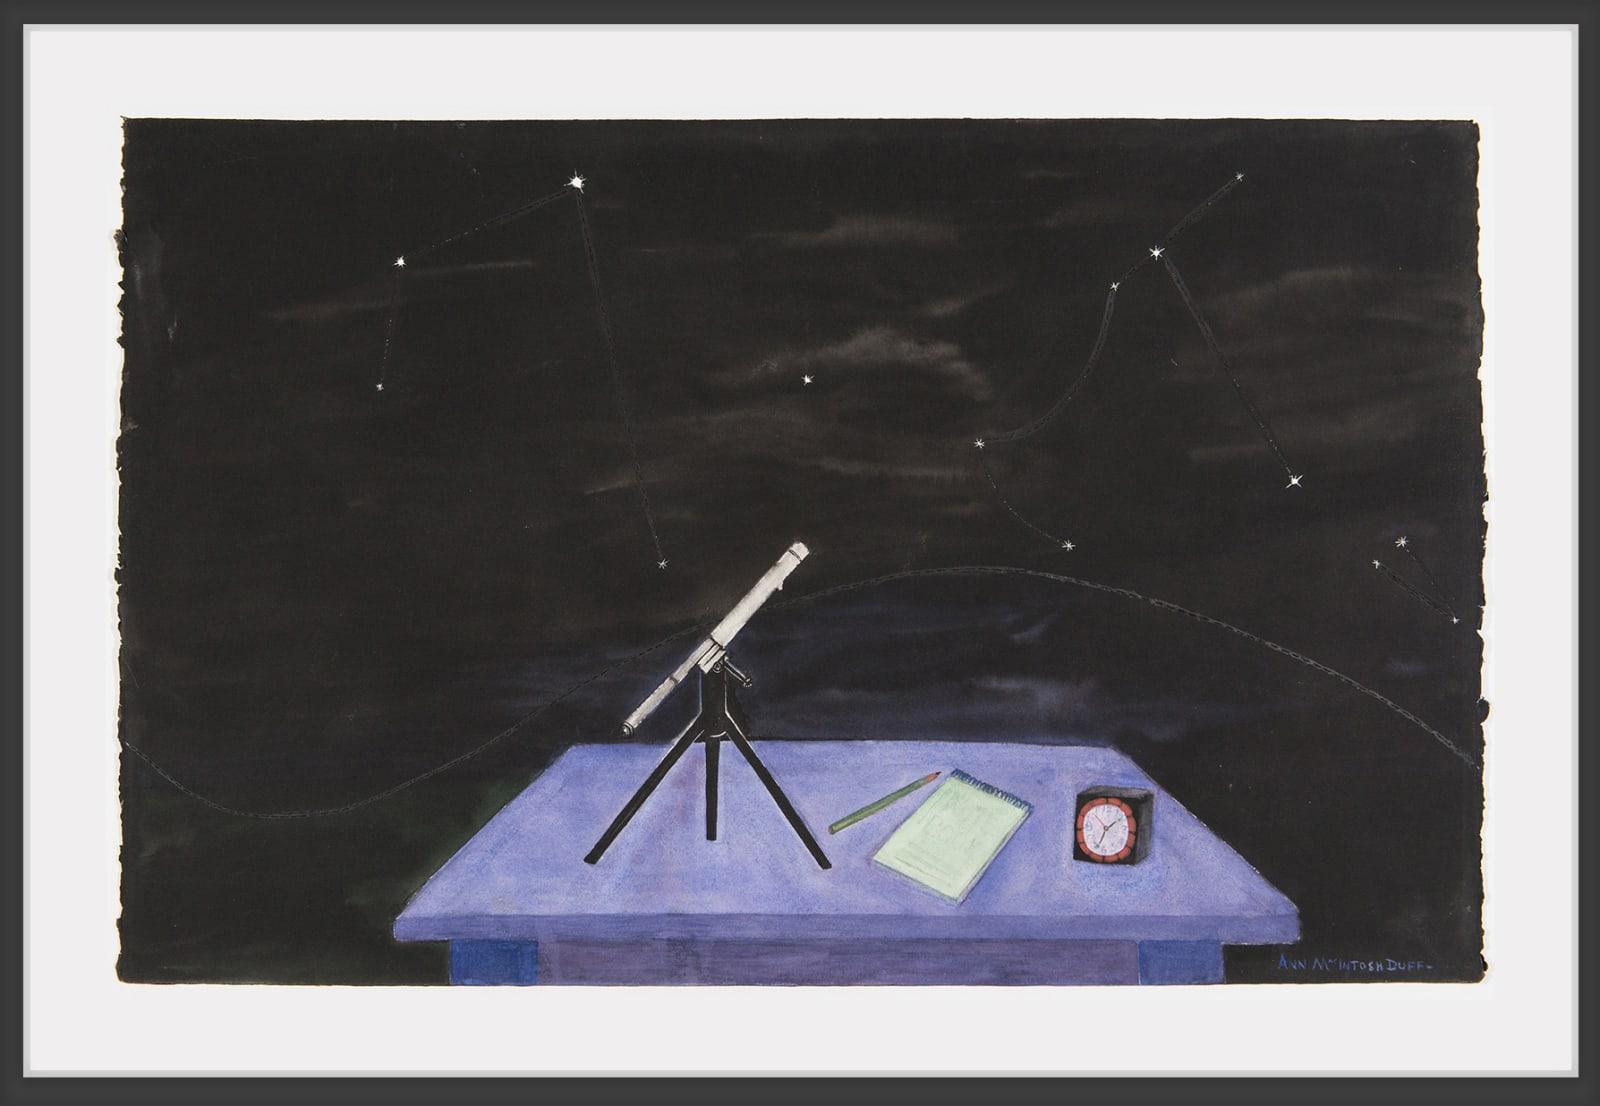 Ann MacIntosh Duff, The Explorer, c. 1990